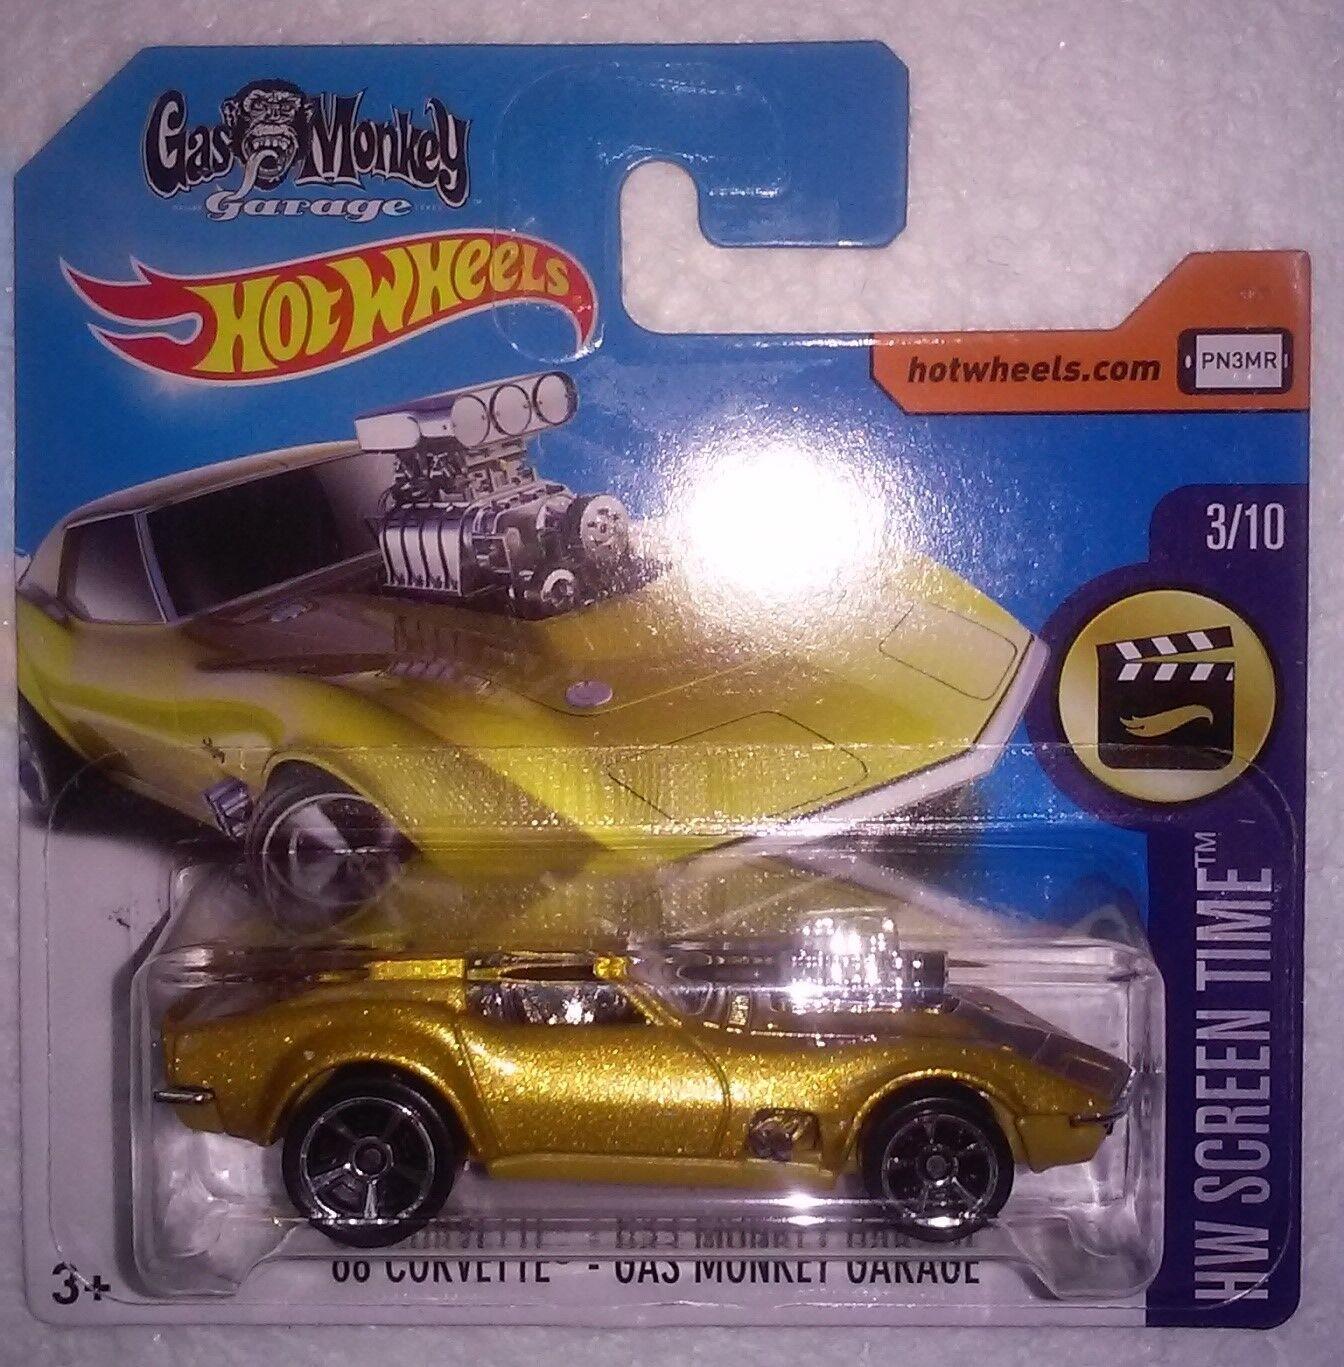 Hot Wheels Hunt (1) 2018 -'68 Corvette-Gas Monkey Garage-Tarjeta Corta (menta en tarjeta de Menta)